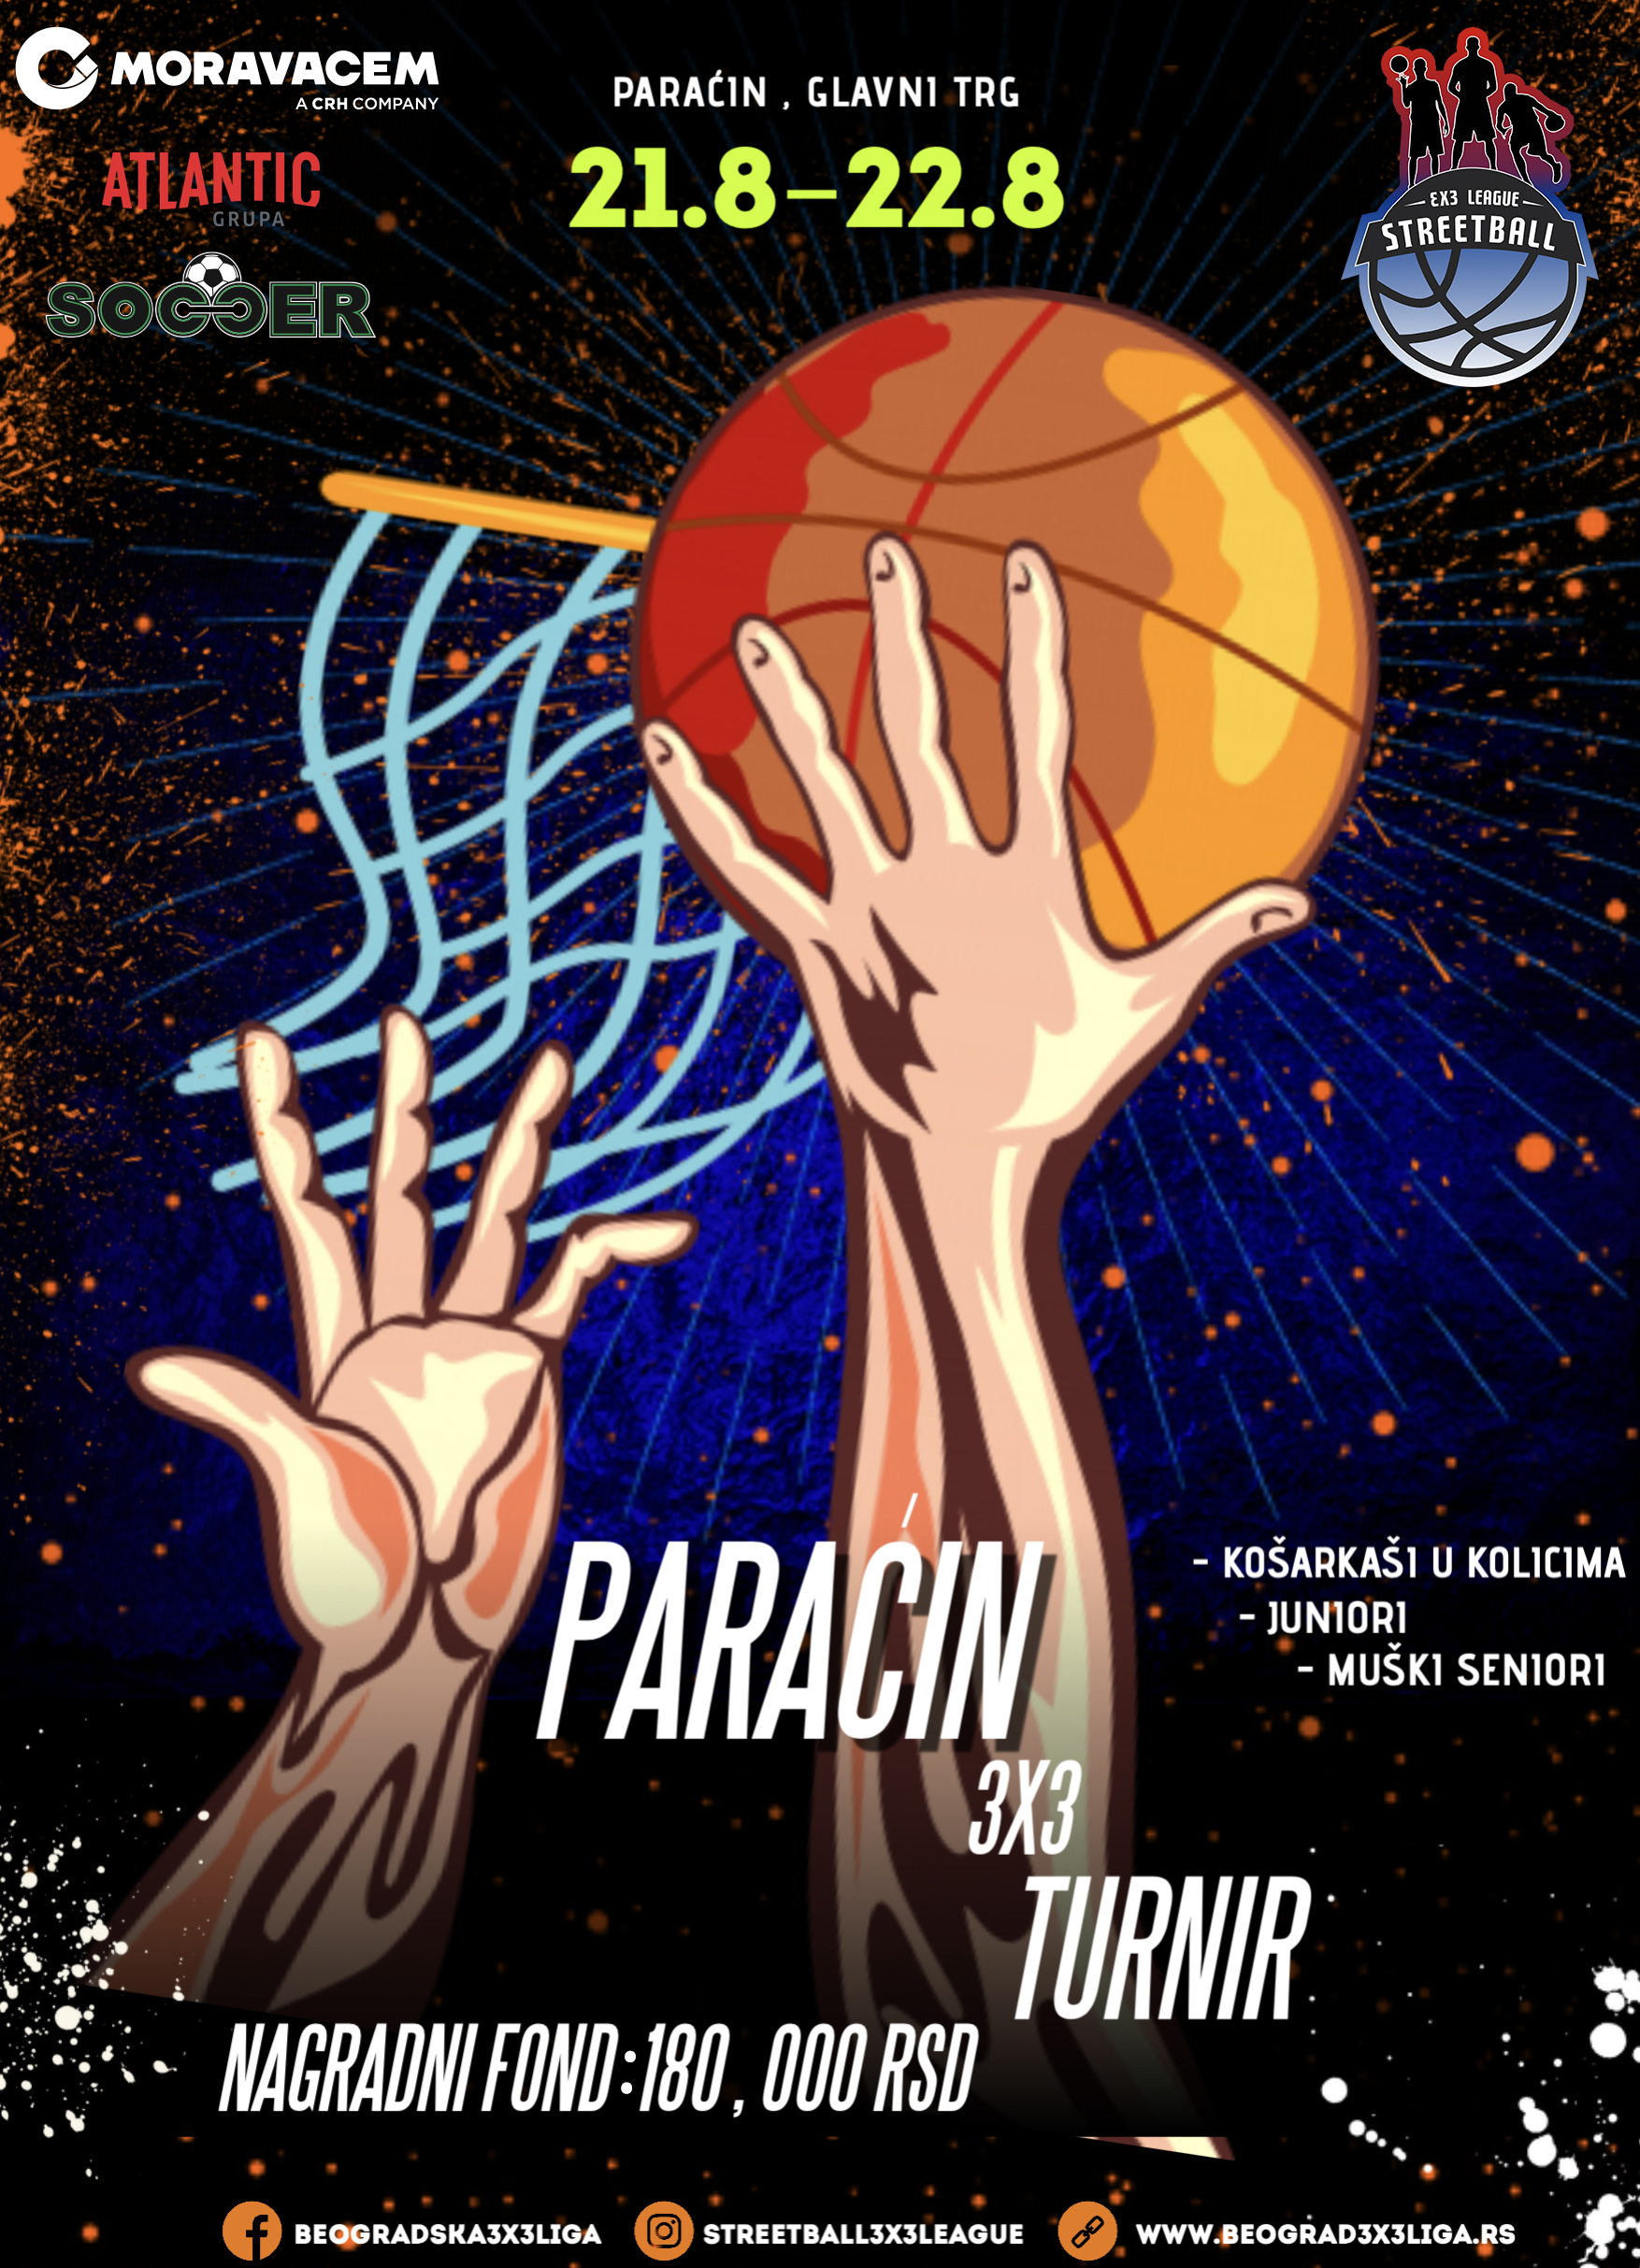 Ovog vikenda u centru Paraćina turnir 3X3 u basketu